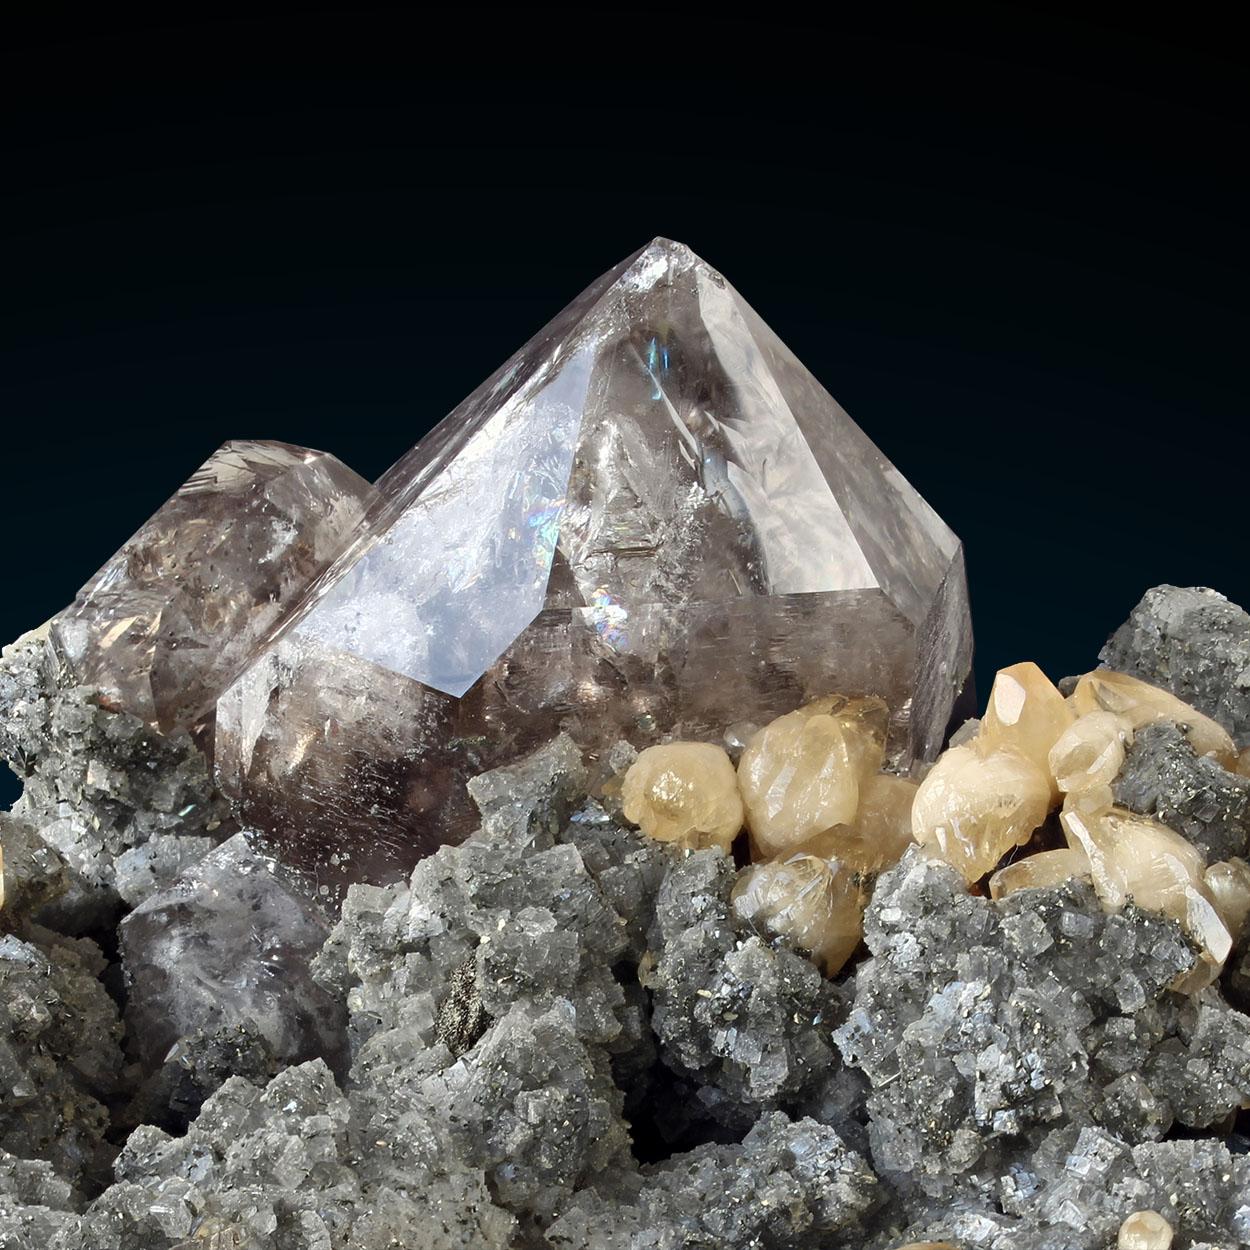 Smoky Quartz Calcite Dolomite Pyrite & Sphalerite